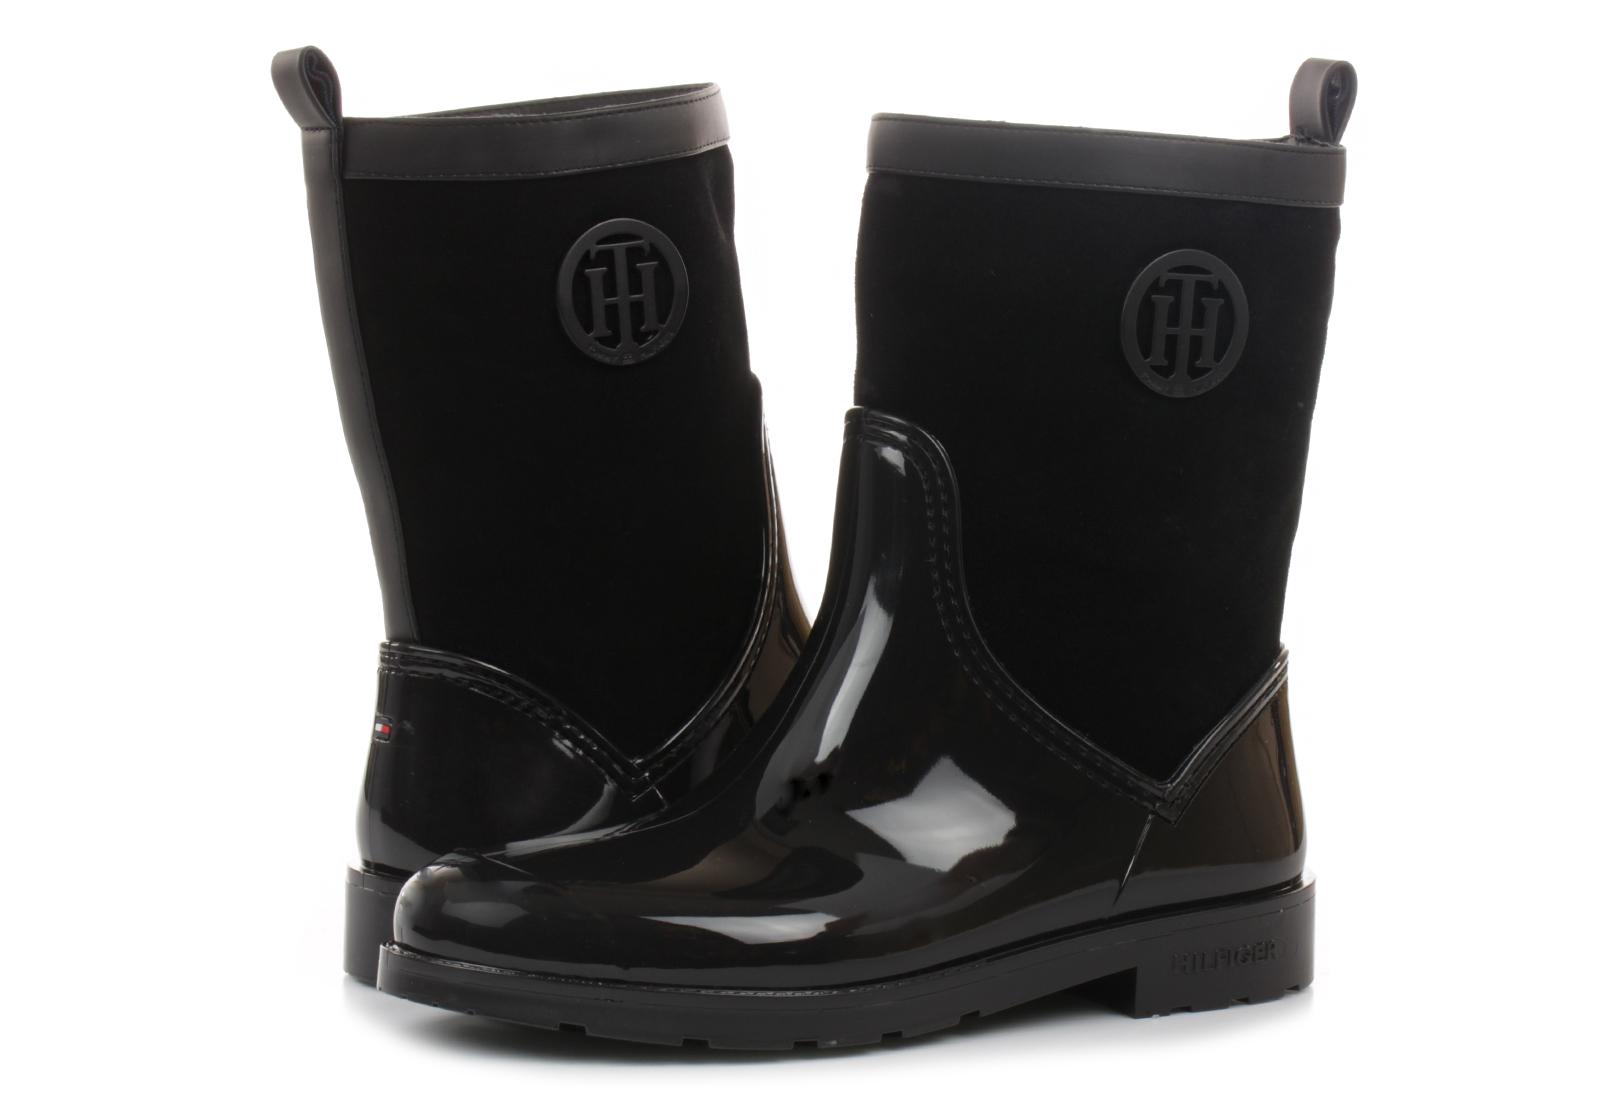 e94d0ab6d1f4 Tommy Hilfiger Boots - Oxford 8rw - 17F-1816-990 - Online shop for ...